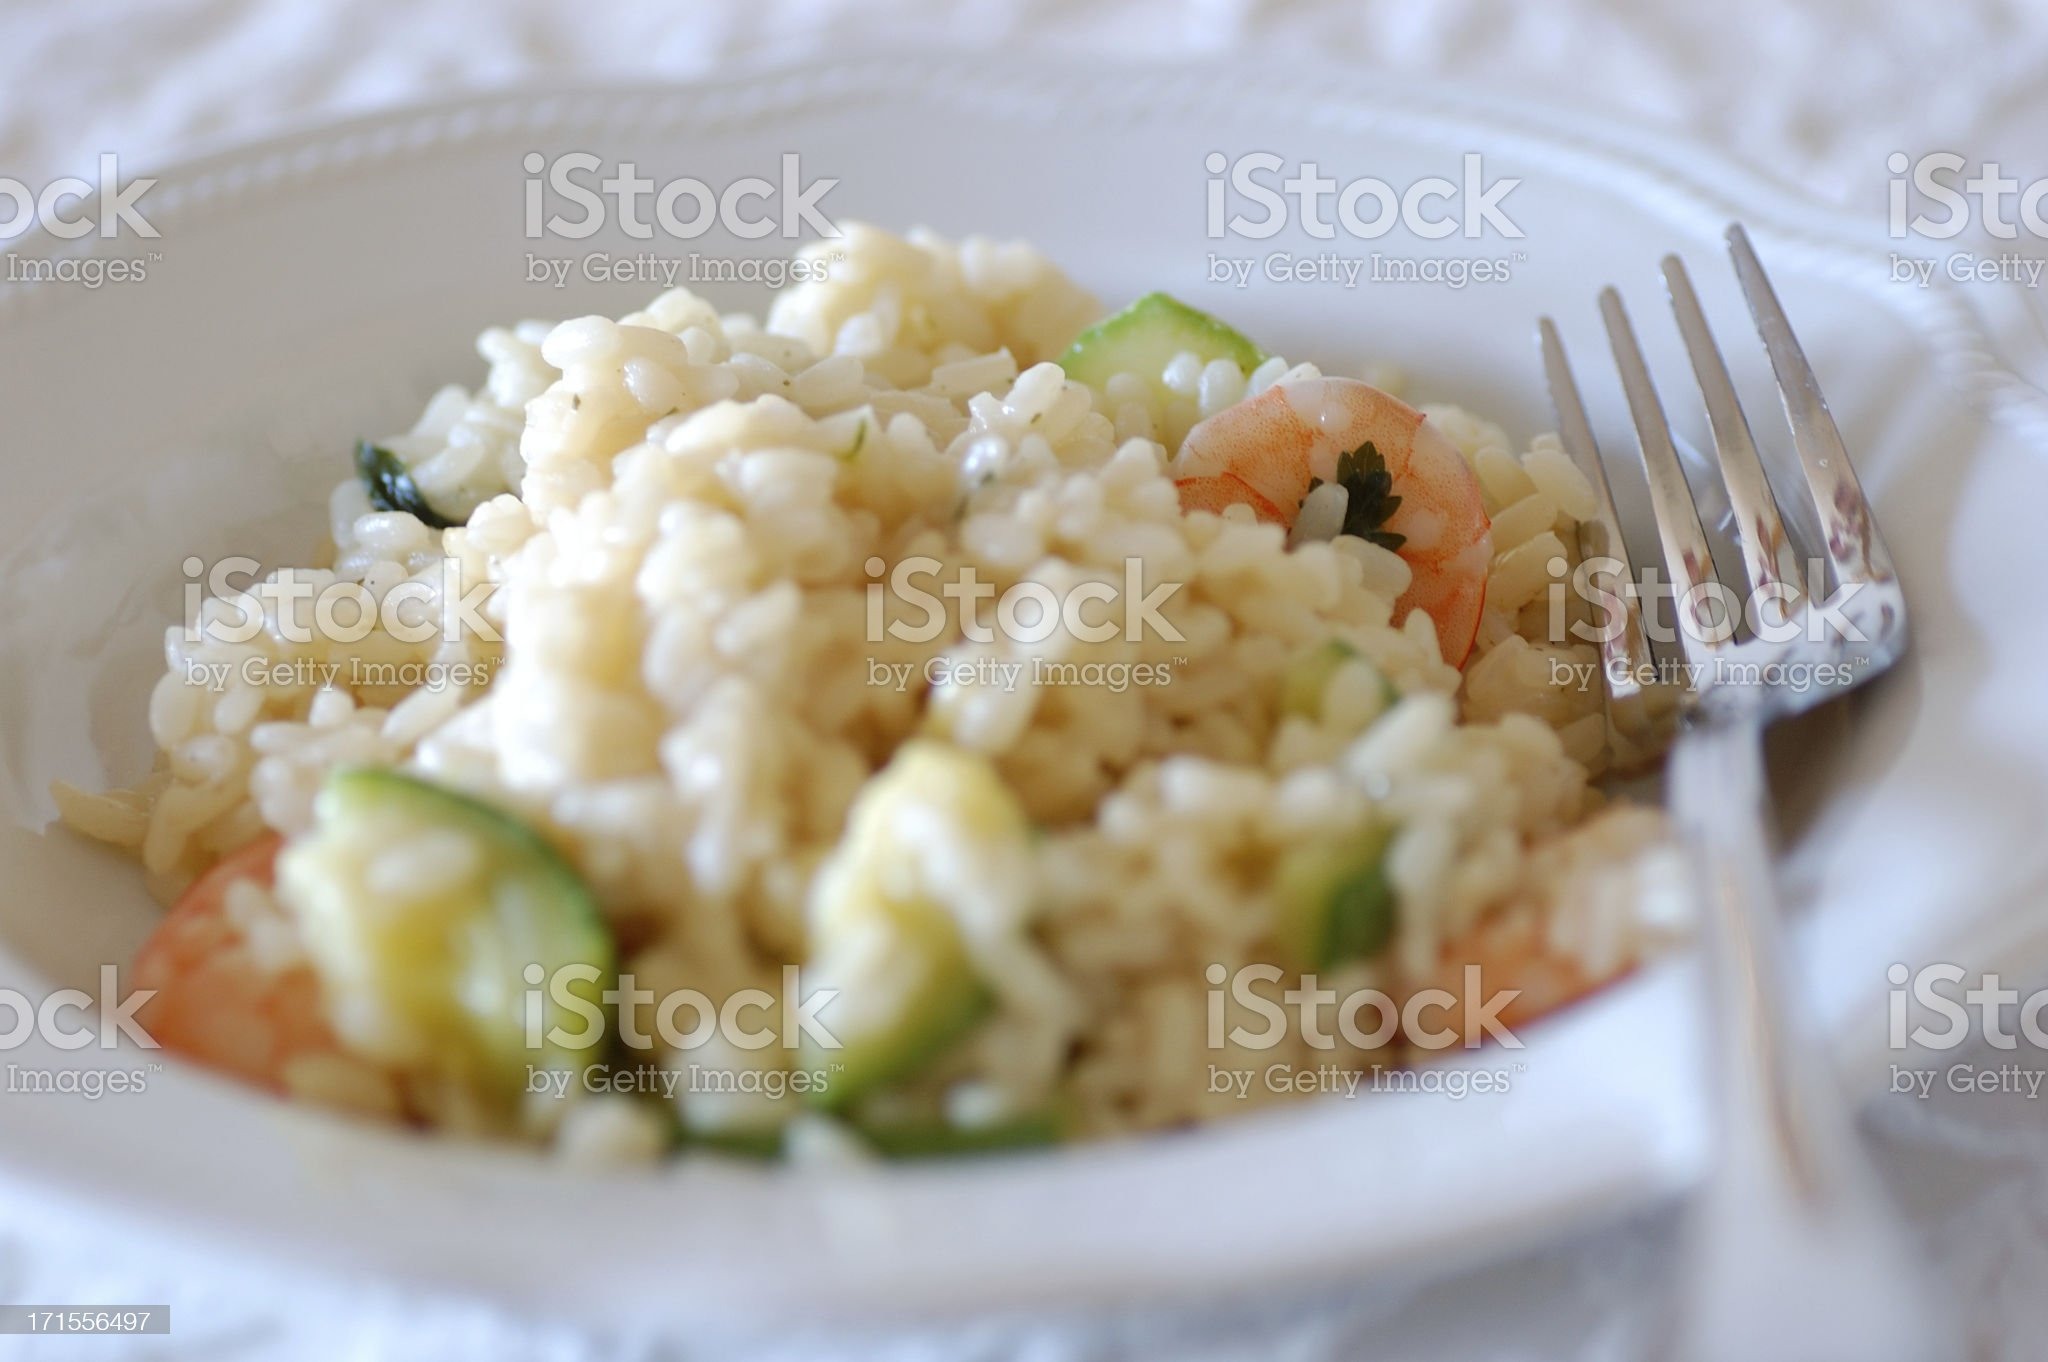 Prawn and Zucchini Risotto royalty-free stock photo